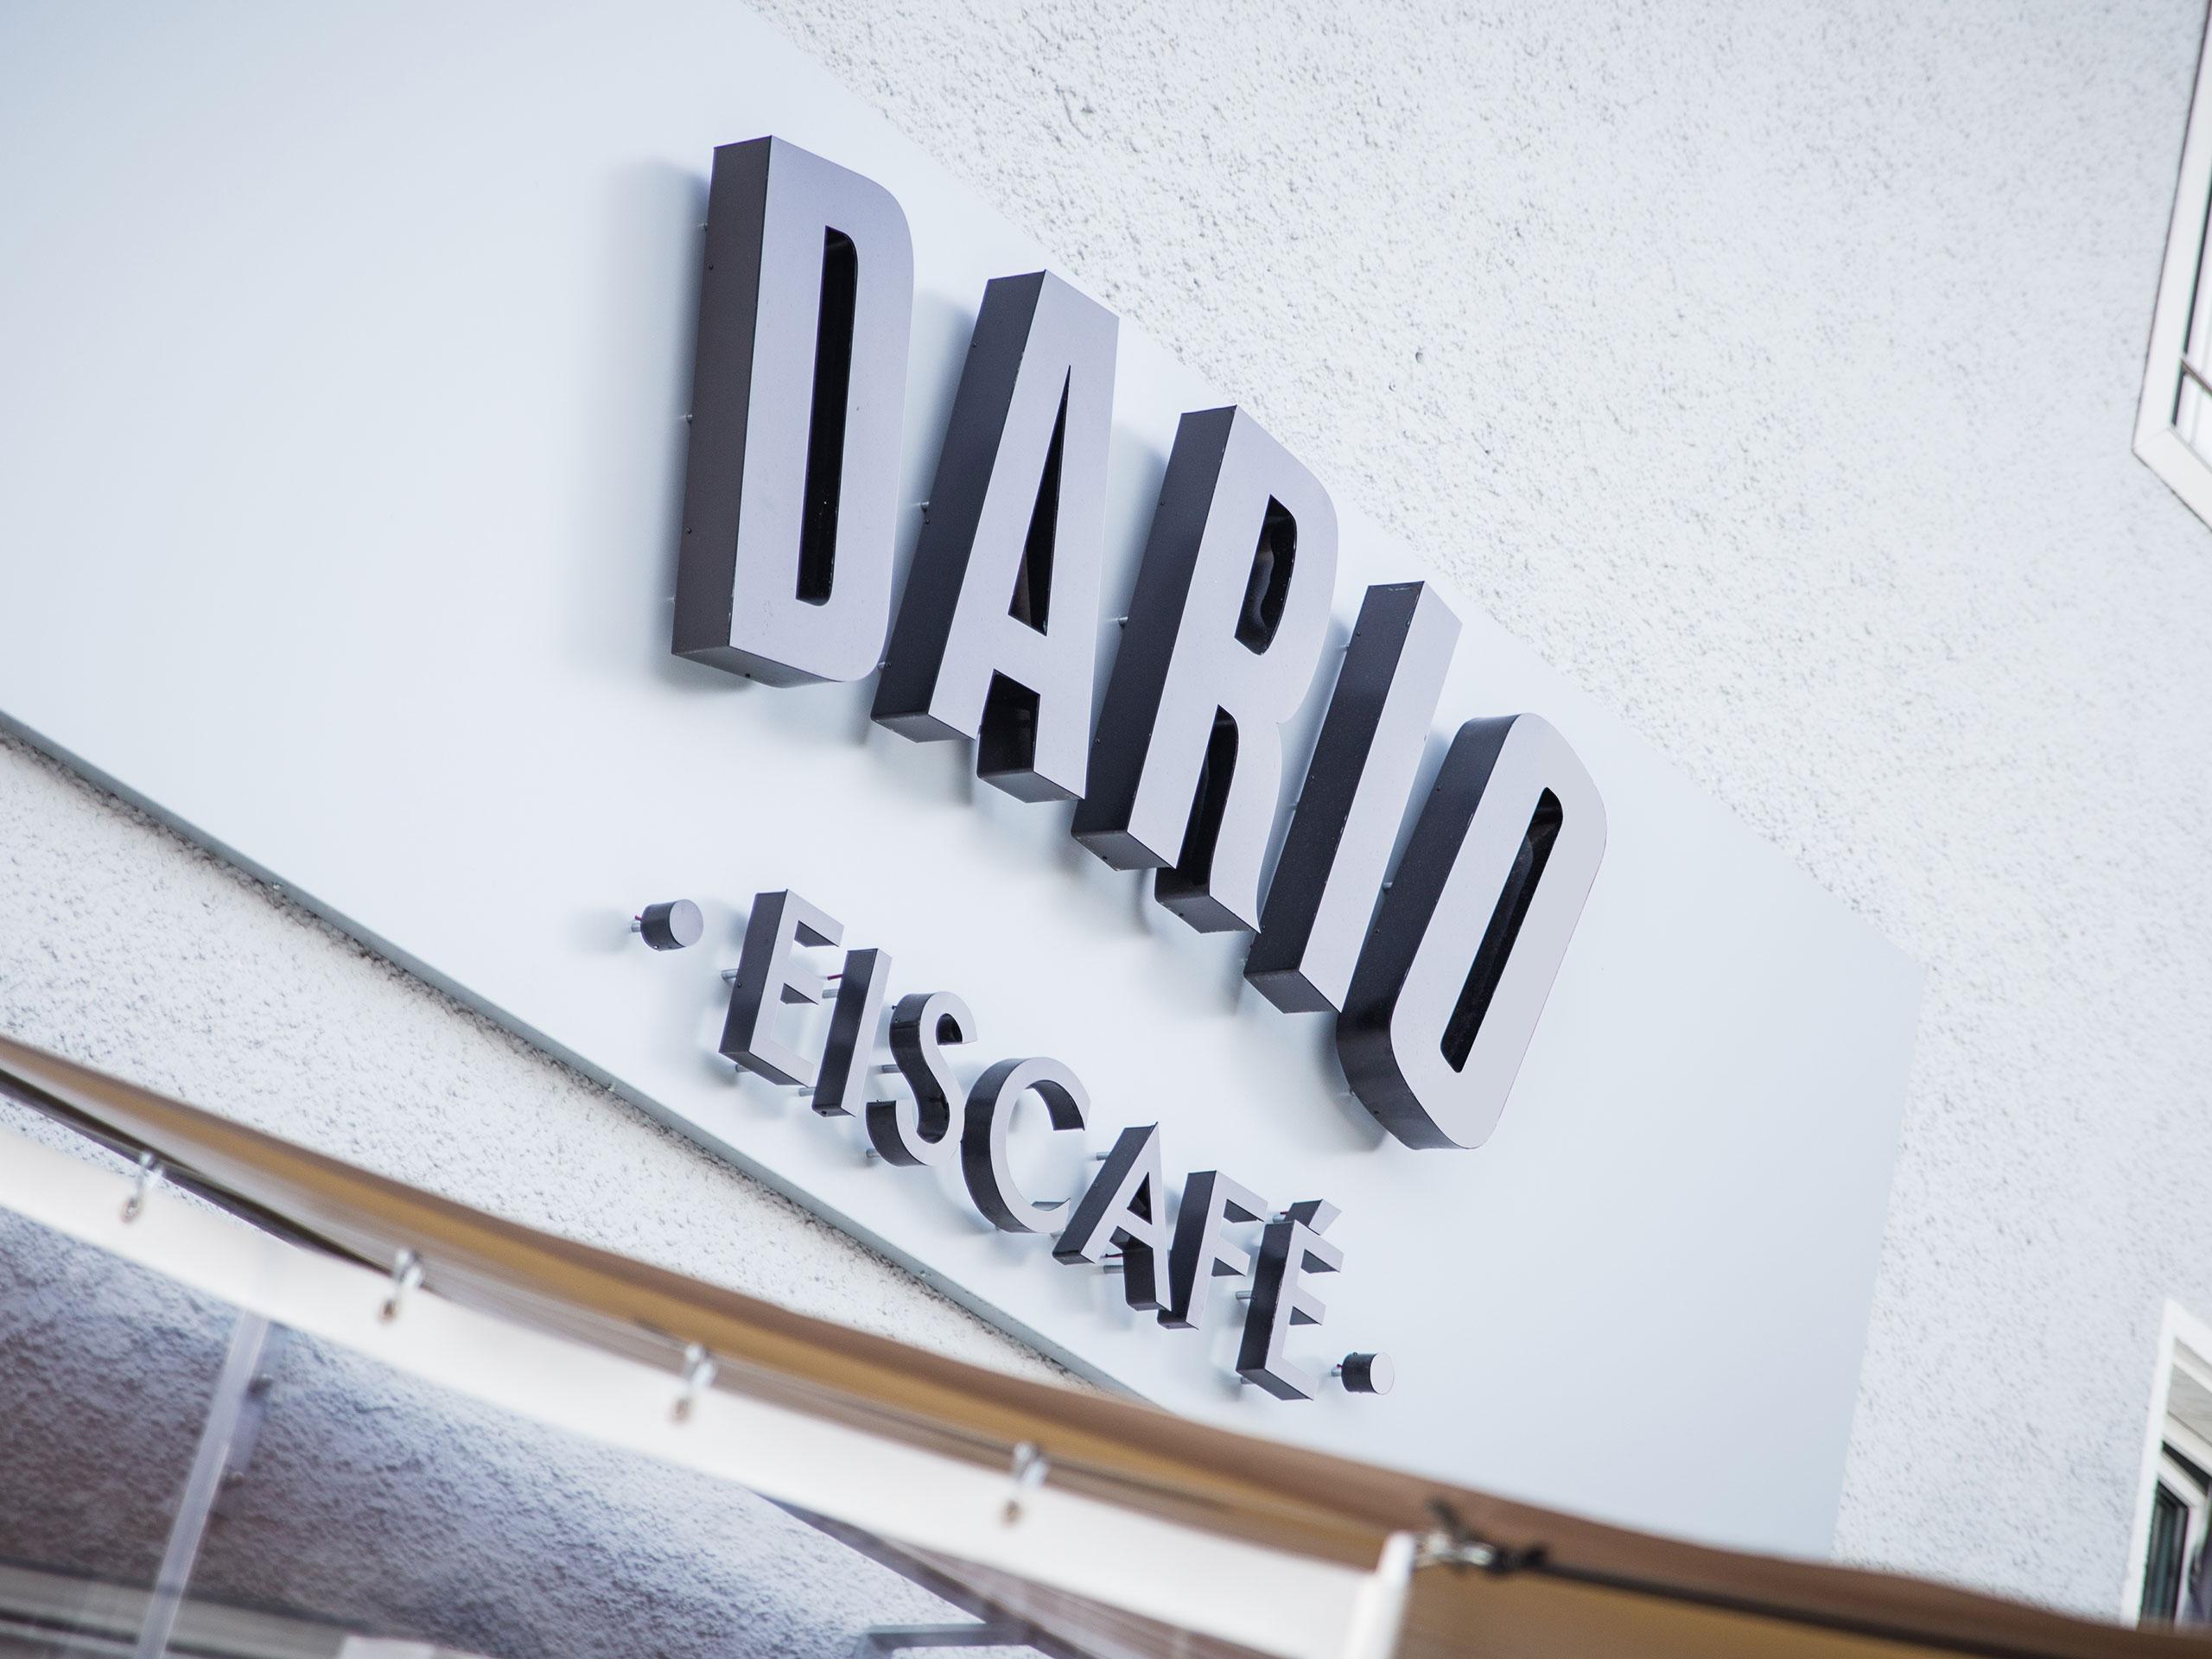 Dario Eiscafé – Logo als 3-dimensionales Schild